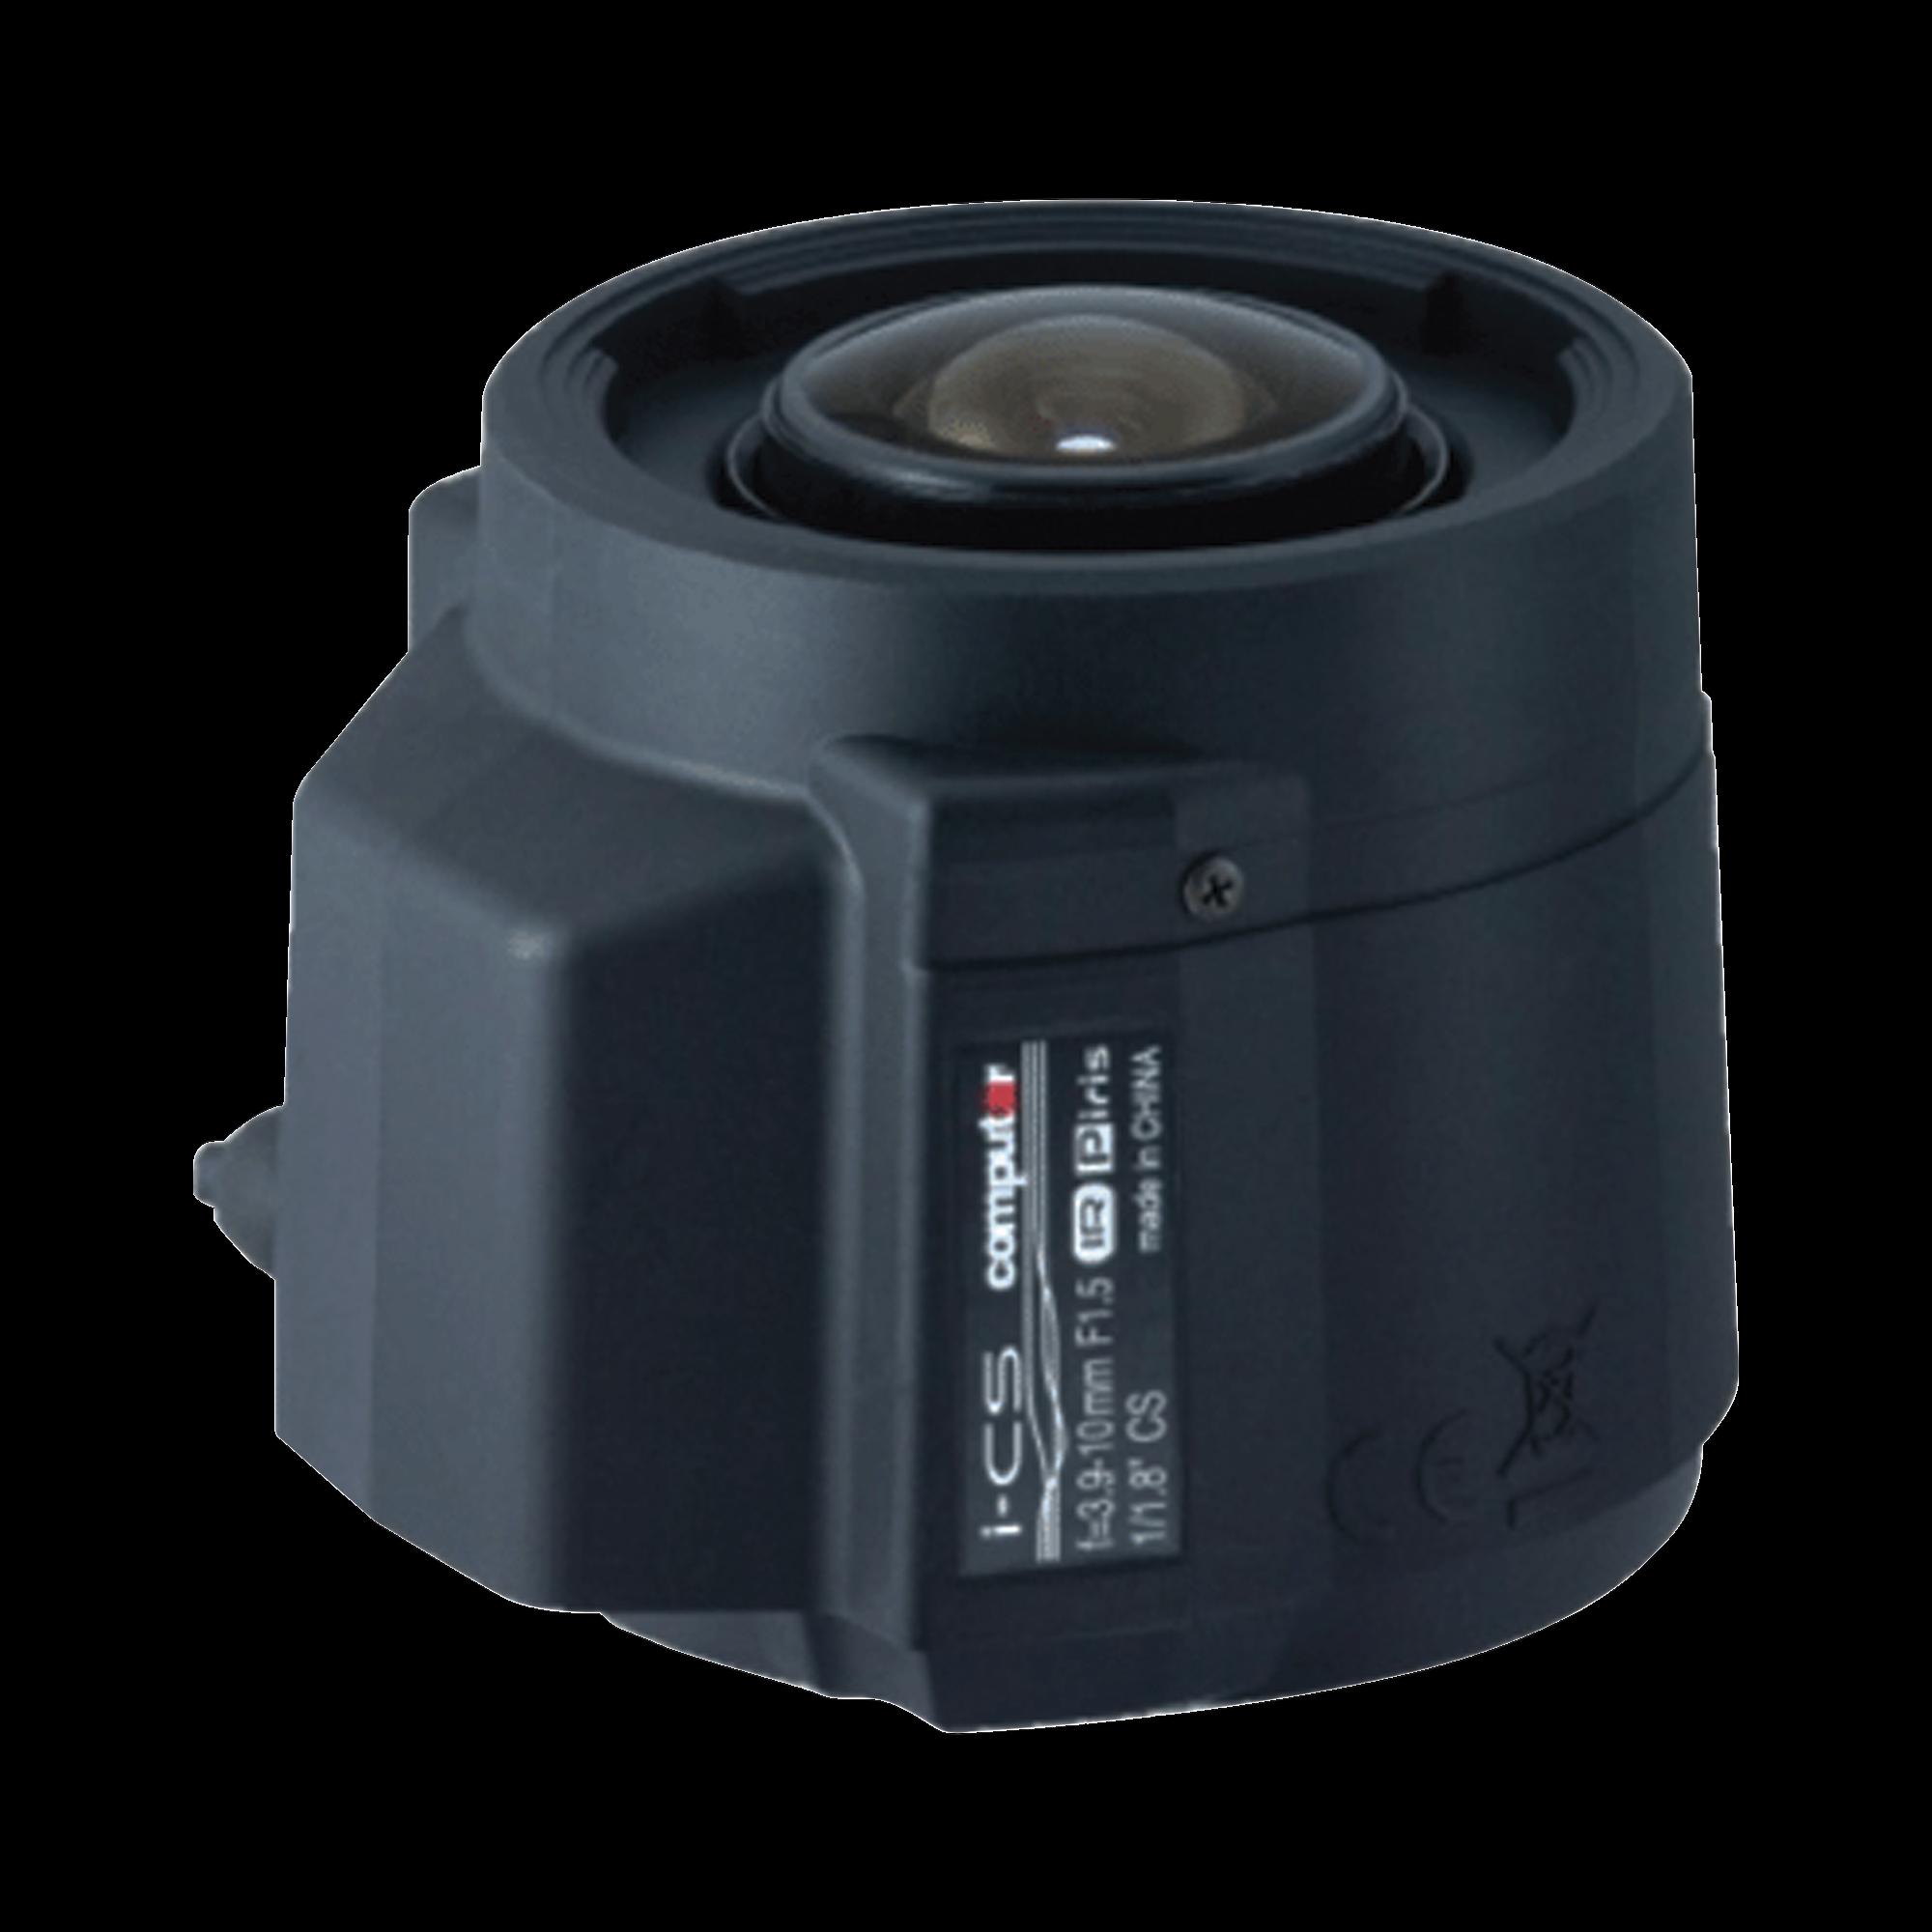 Lente Valifocal 3.9 - 10mm, 12MP, P-iris, Formato de 1/1.8, para cámara PNB-A9001